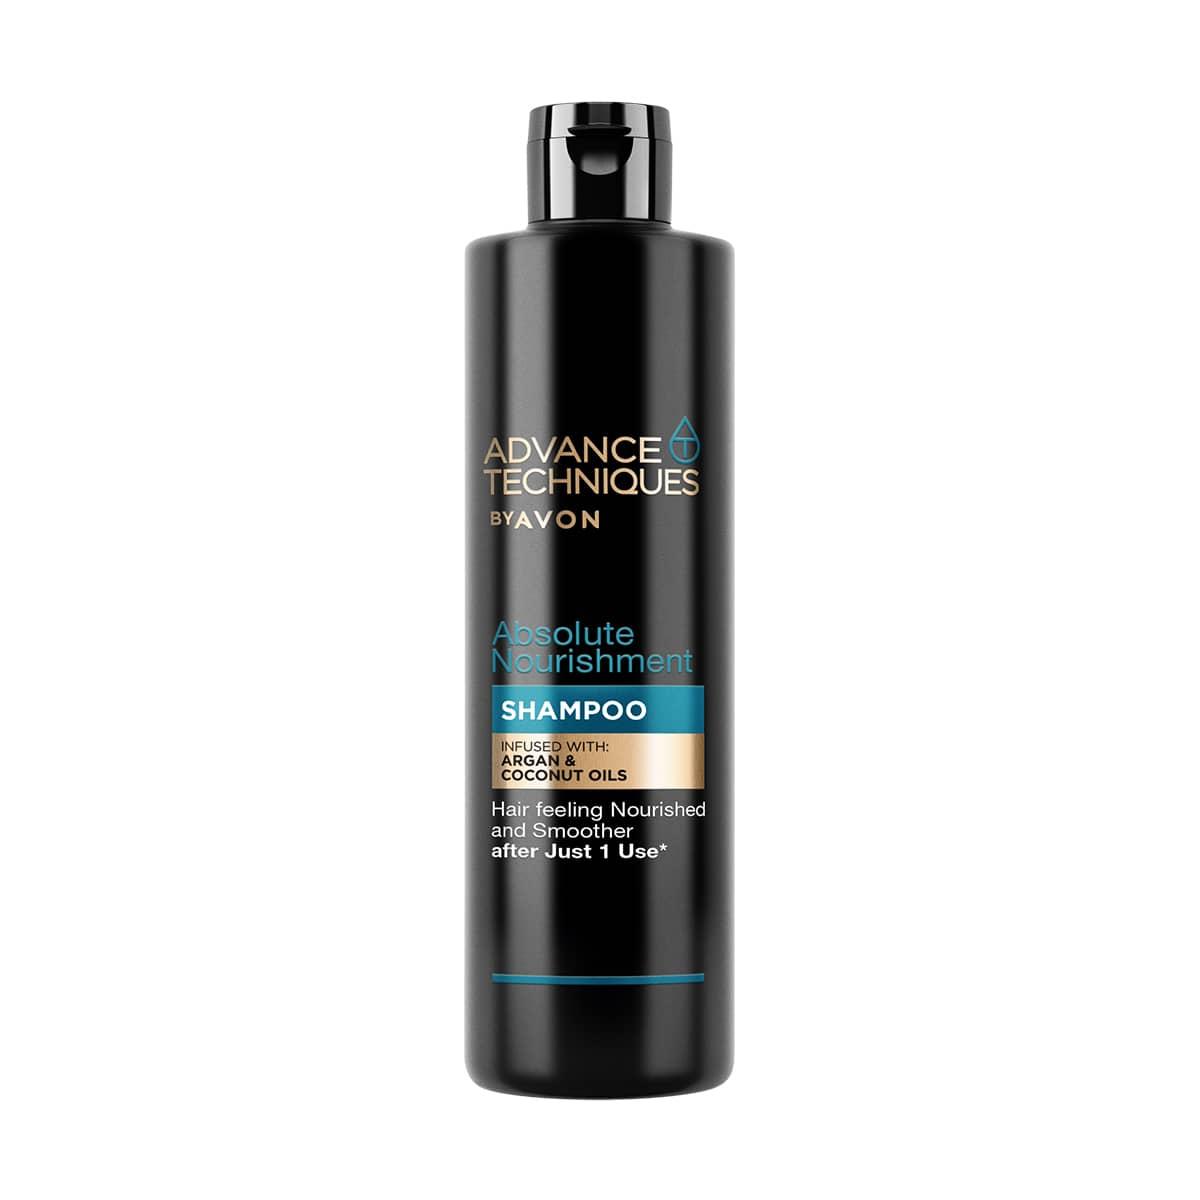 Advance Techniques Absolute Nourishment Shampoo 400ml 1374342